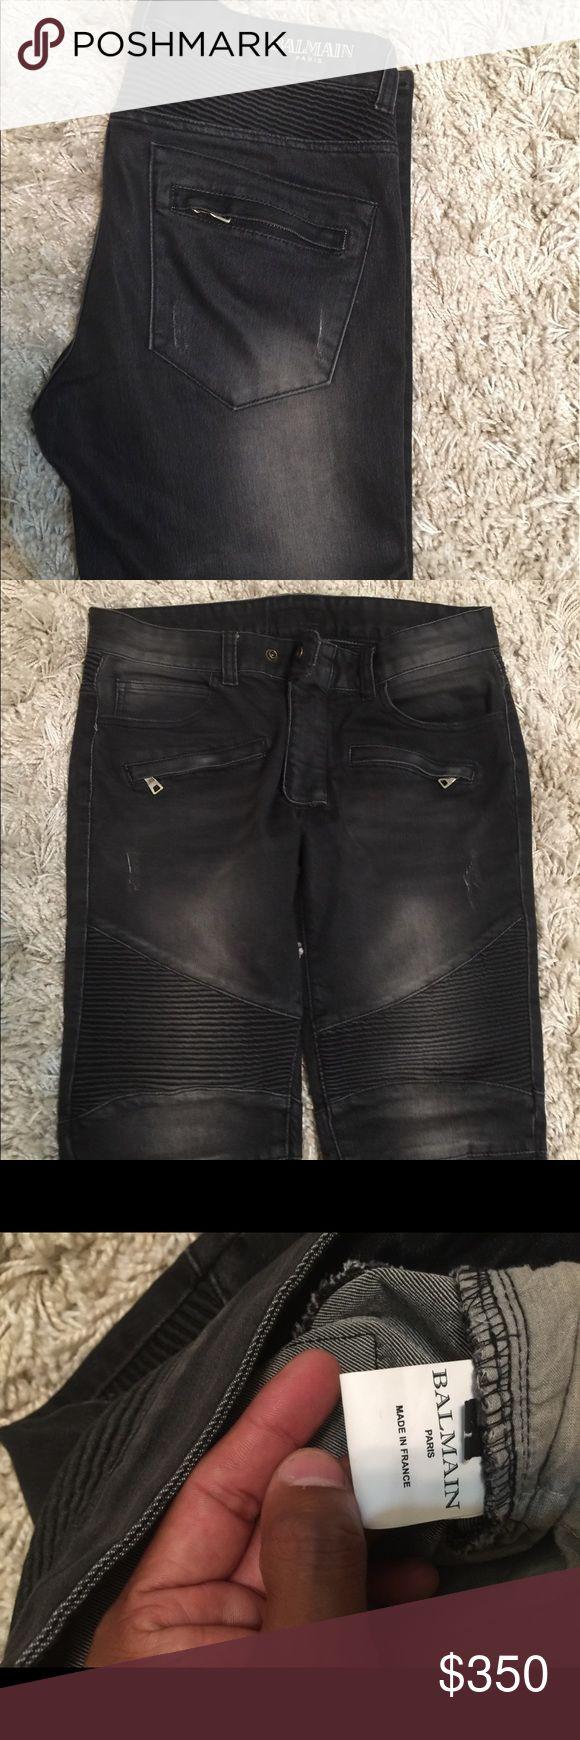 Amazing balmain jeans P A Y  P A L Size 32-33 amazing balmain Jean on sale worn few times- only p a y p a l Balmain Jeans Slim Straight